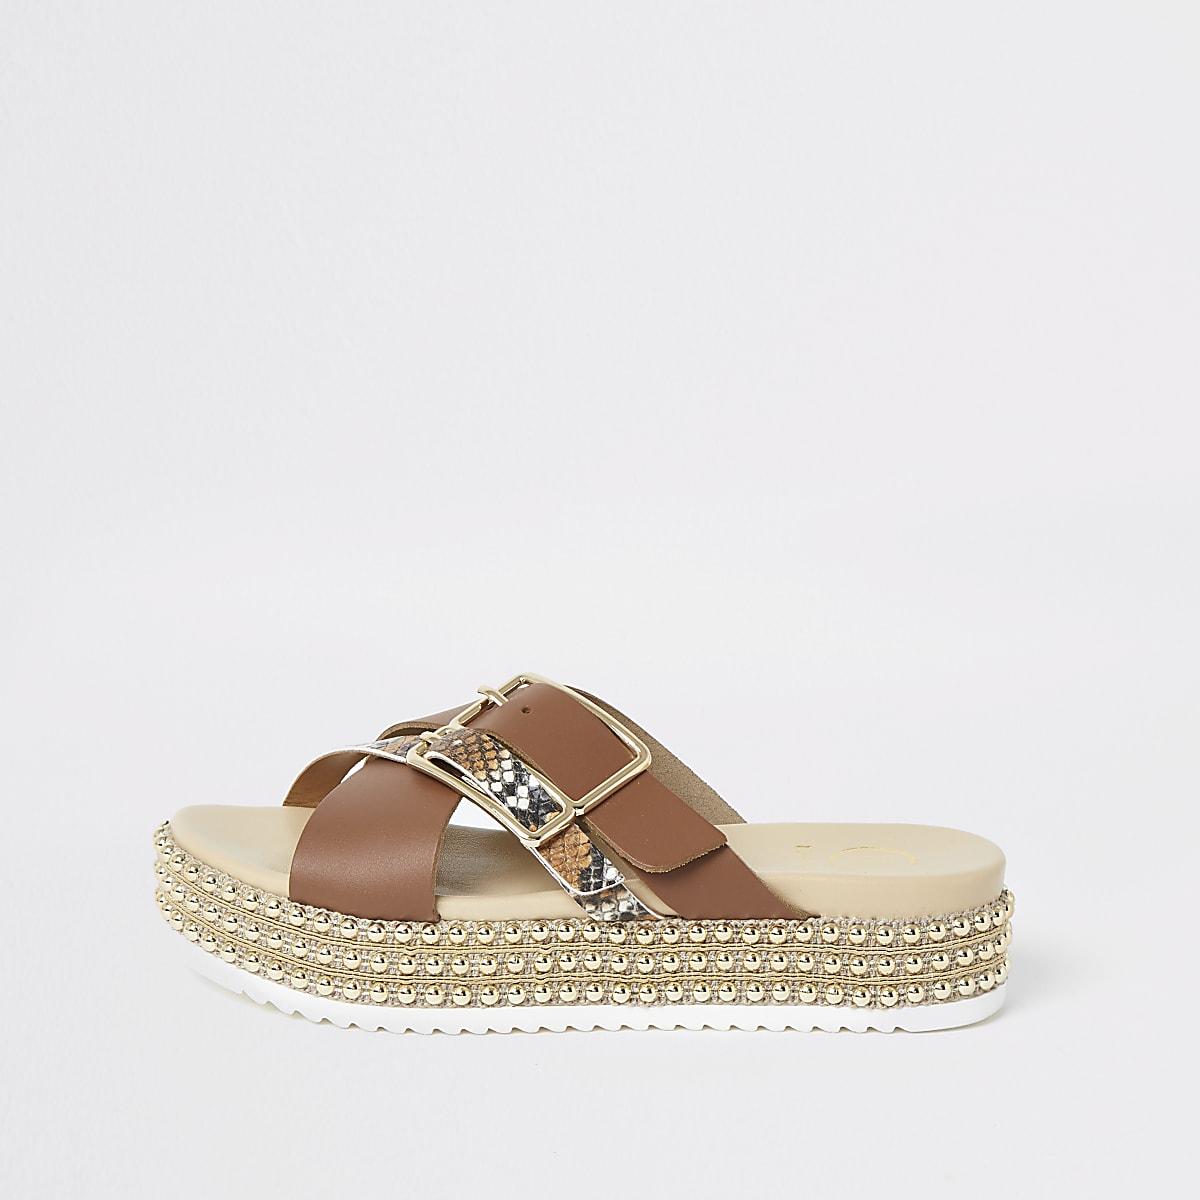 Bruine sandalen gesp, kralenborduursel en plateauzool